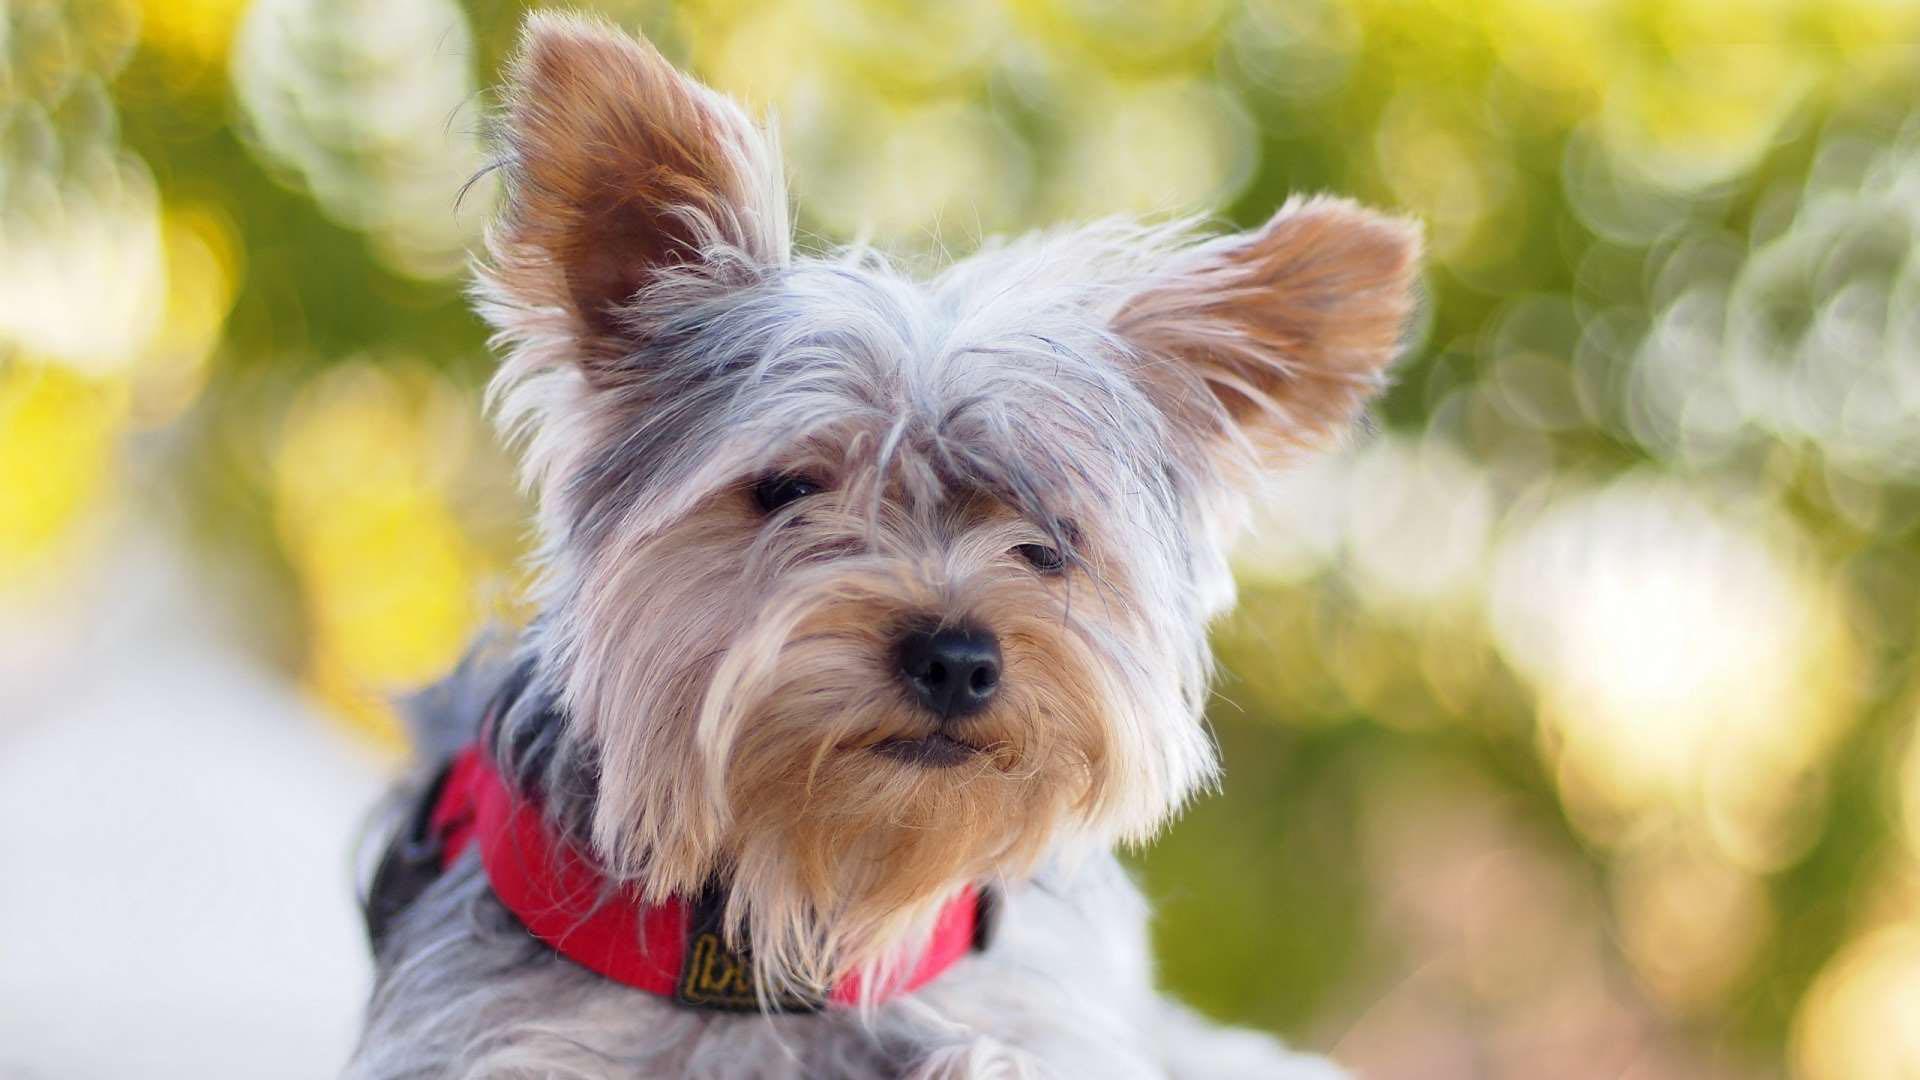 yorkshire terrier dog wallpaper hd 51050